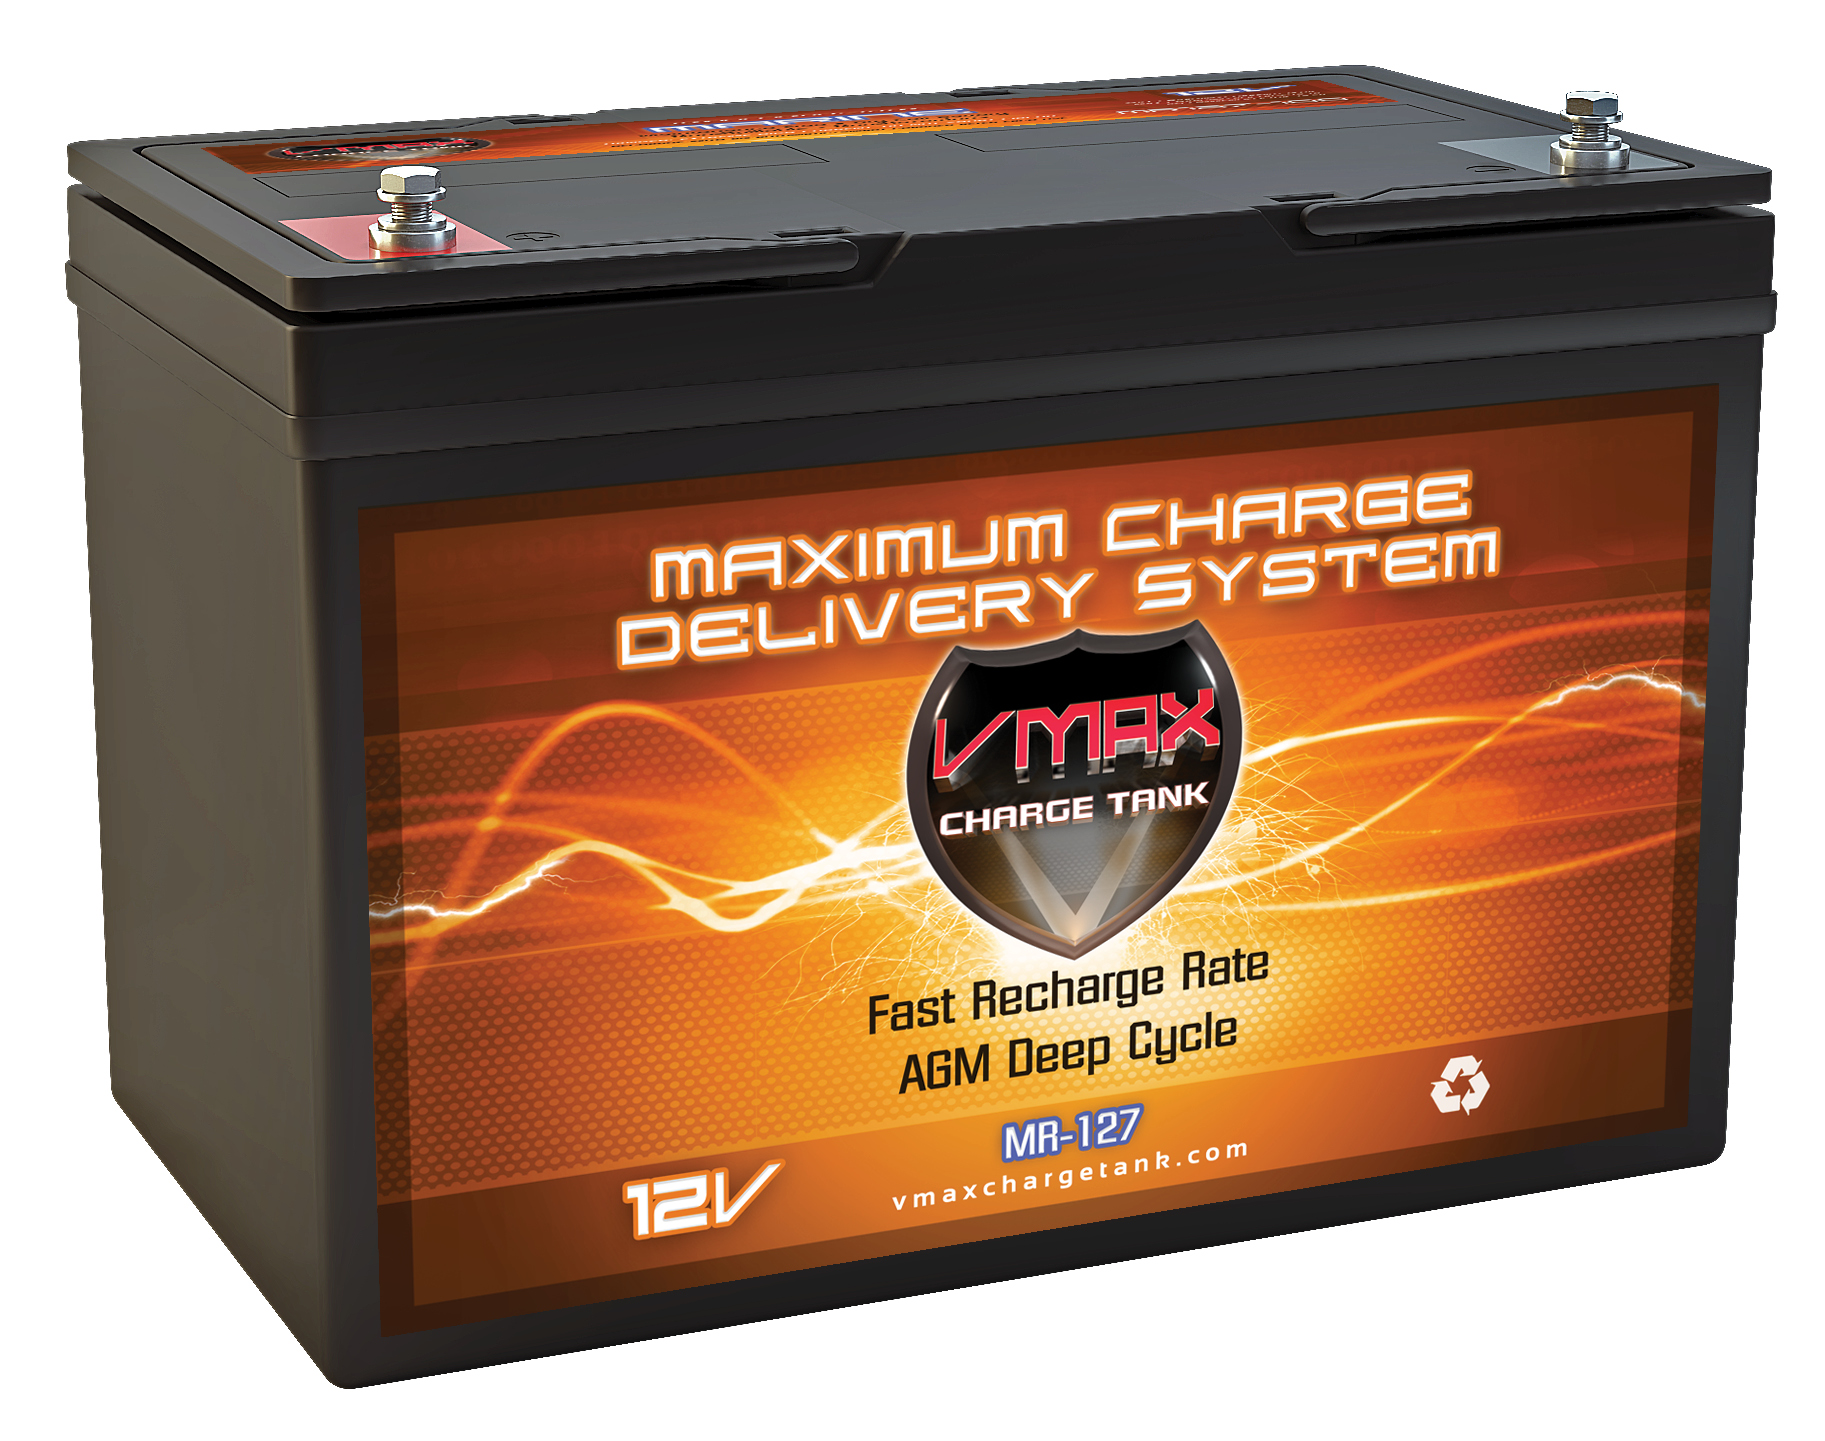 vmax mr127 100 12v 100ah agm deep cycle hi performance battery. Black Bedroom Furniture Sets. Home Design Ideas